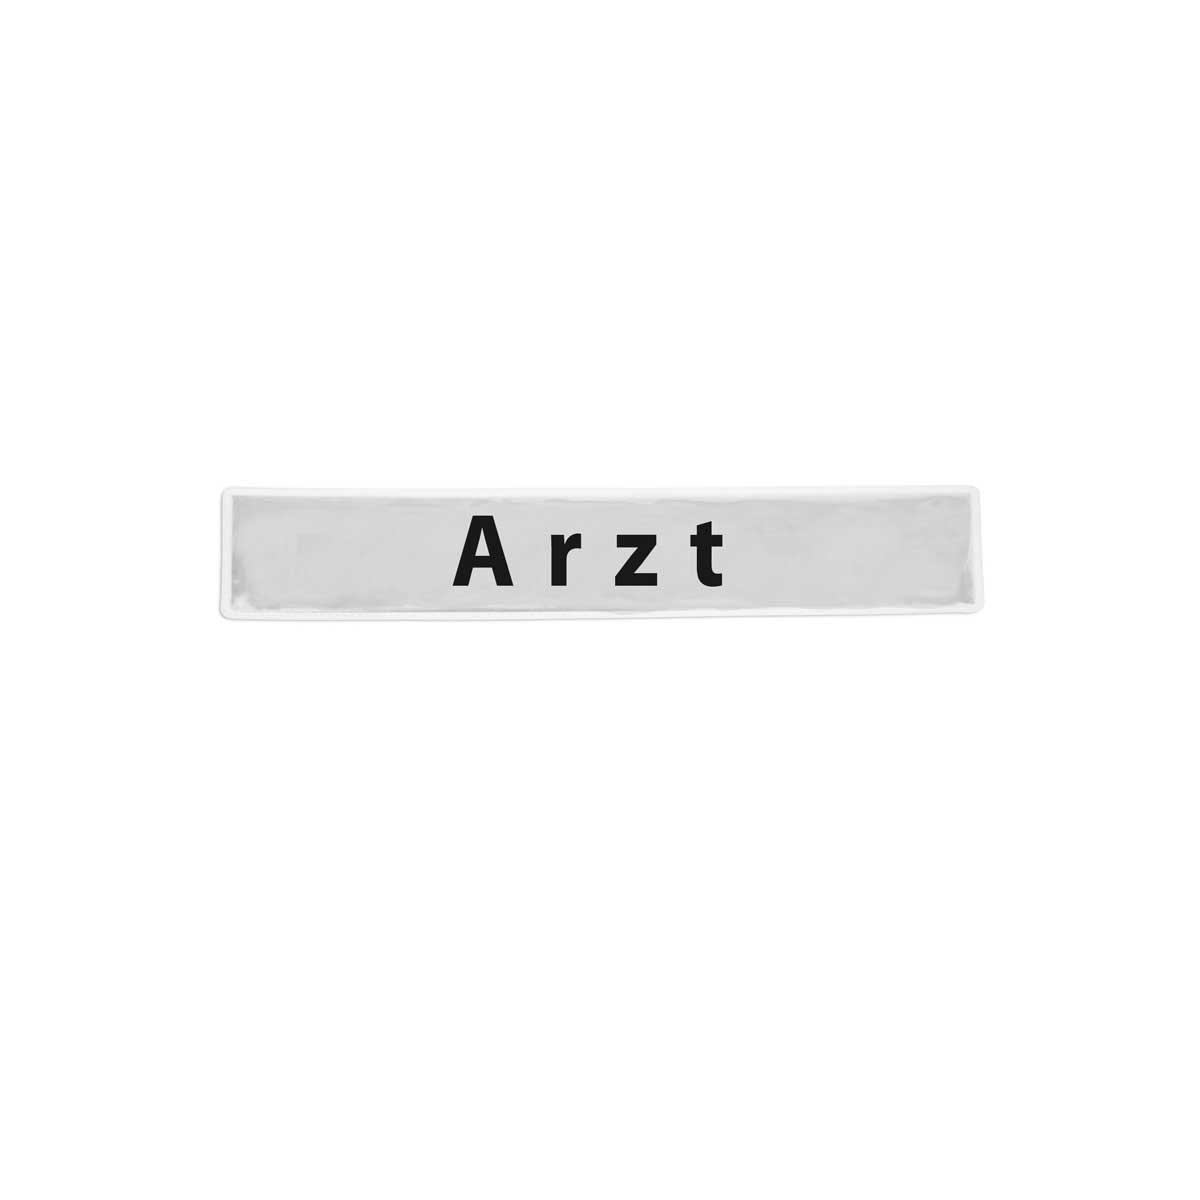 Petzl ID L Rot Abseilgerät Sicherungsgerät Antipanikfunktion PSA Klettern